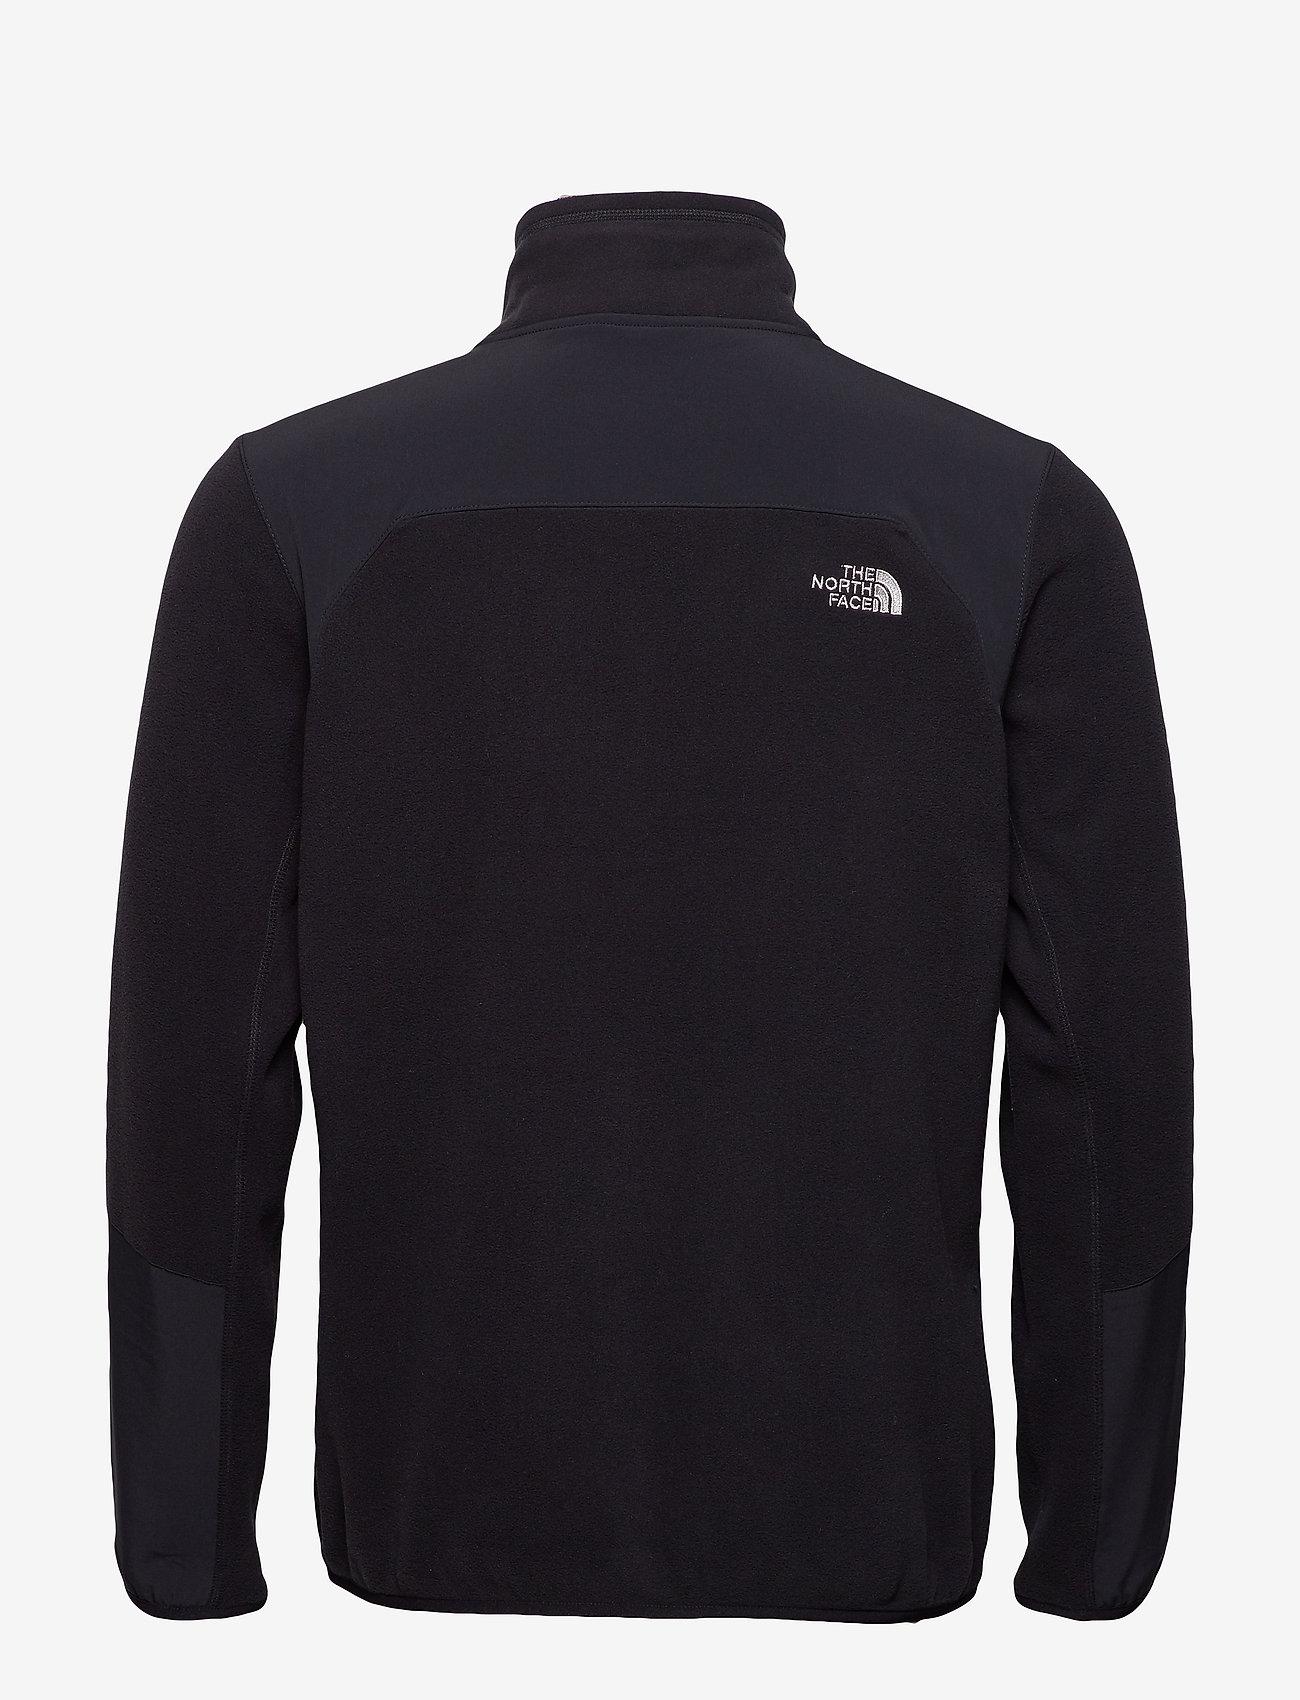 The North Face - M GLACIER PRO FULL Z - fleece - tnf black-tnf black - 1